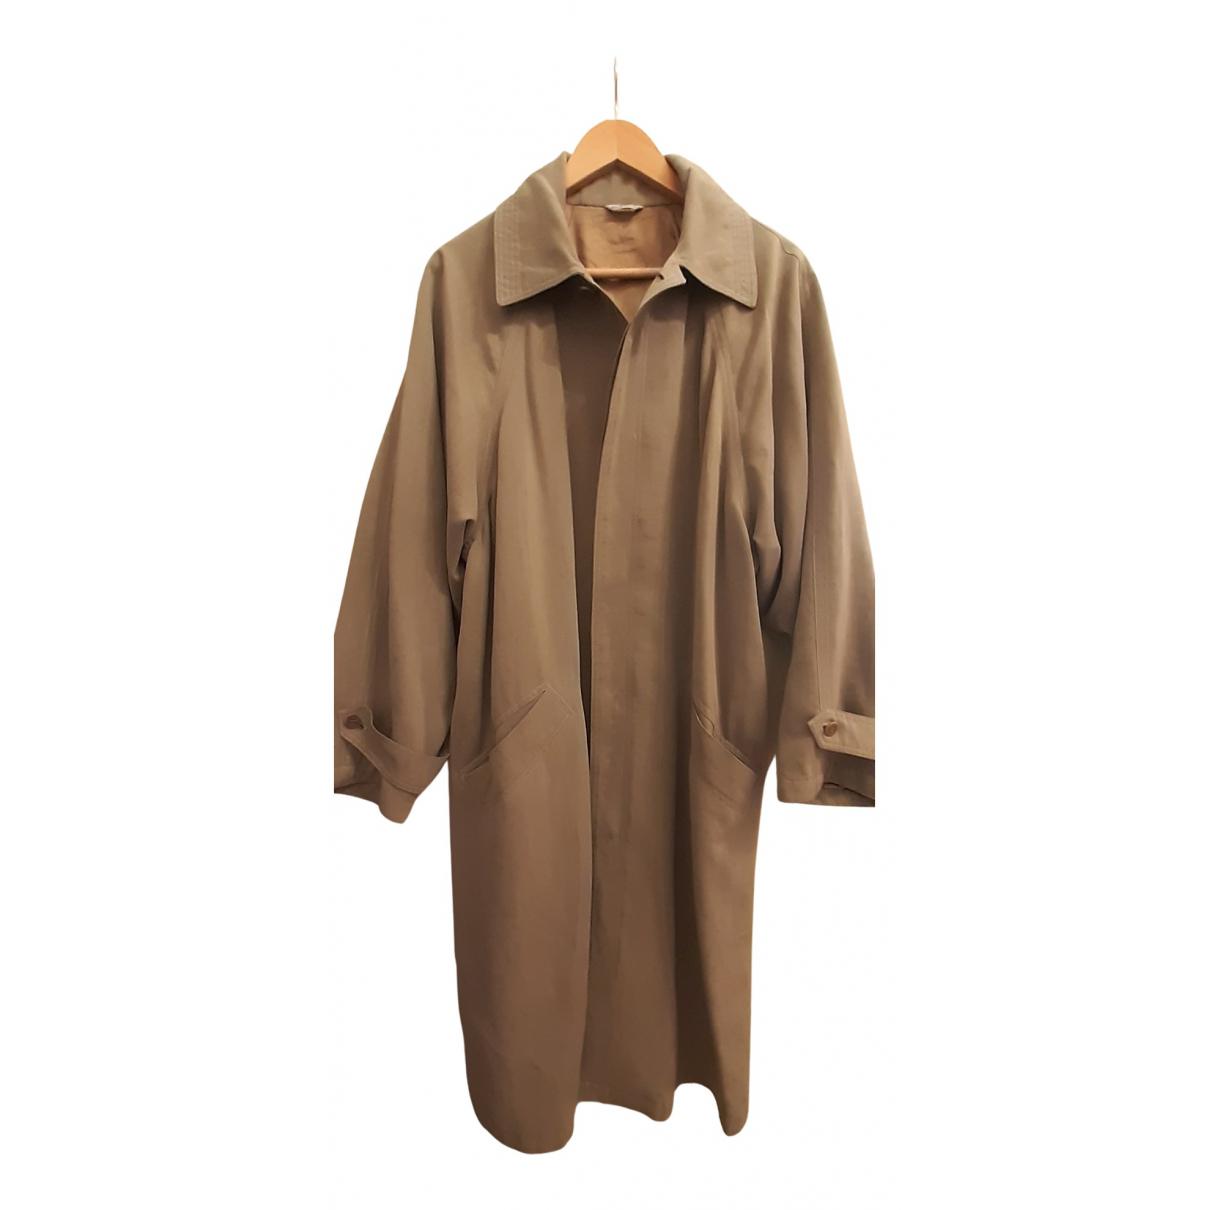 Gianni Versace N Beige Wool coat  for Men 46 IT